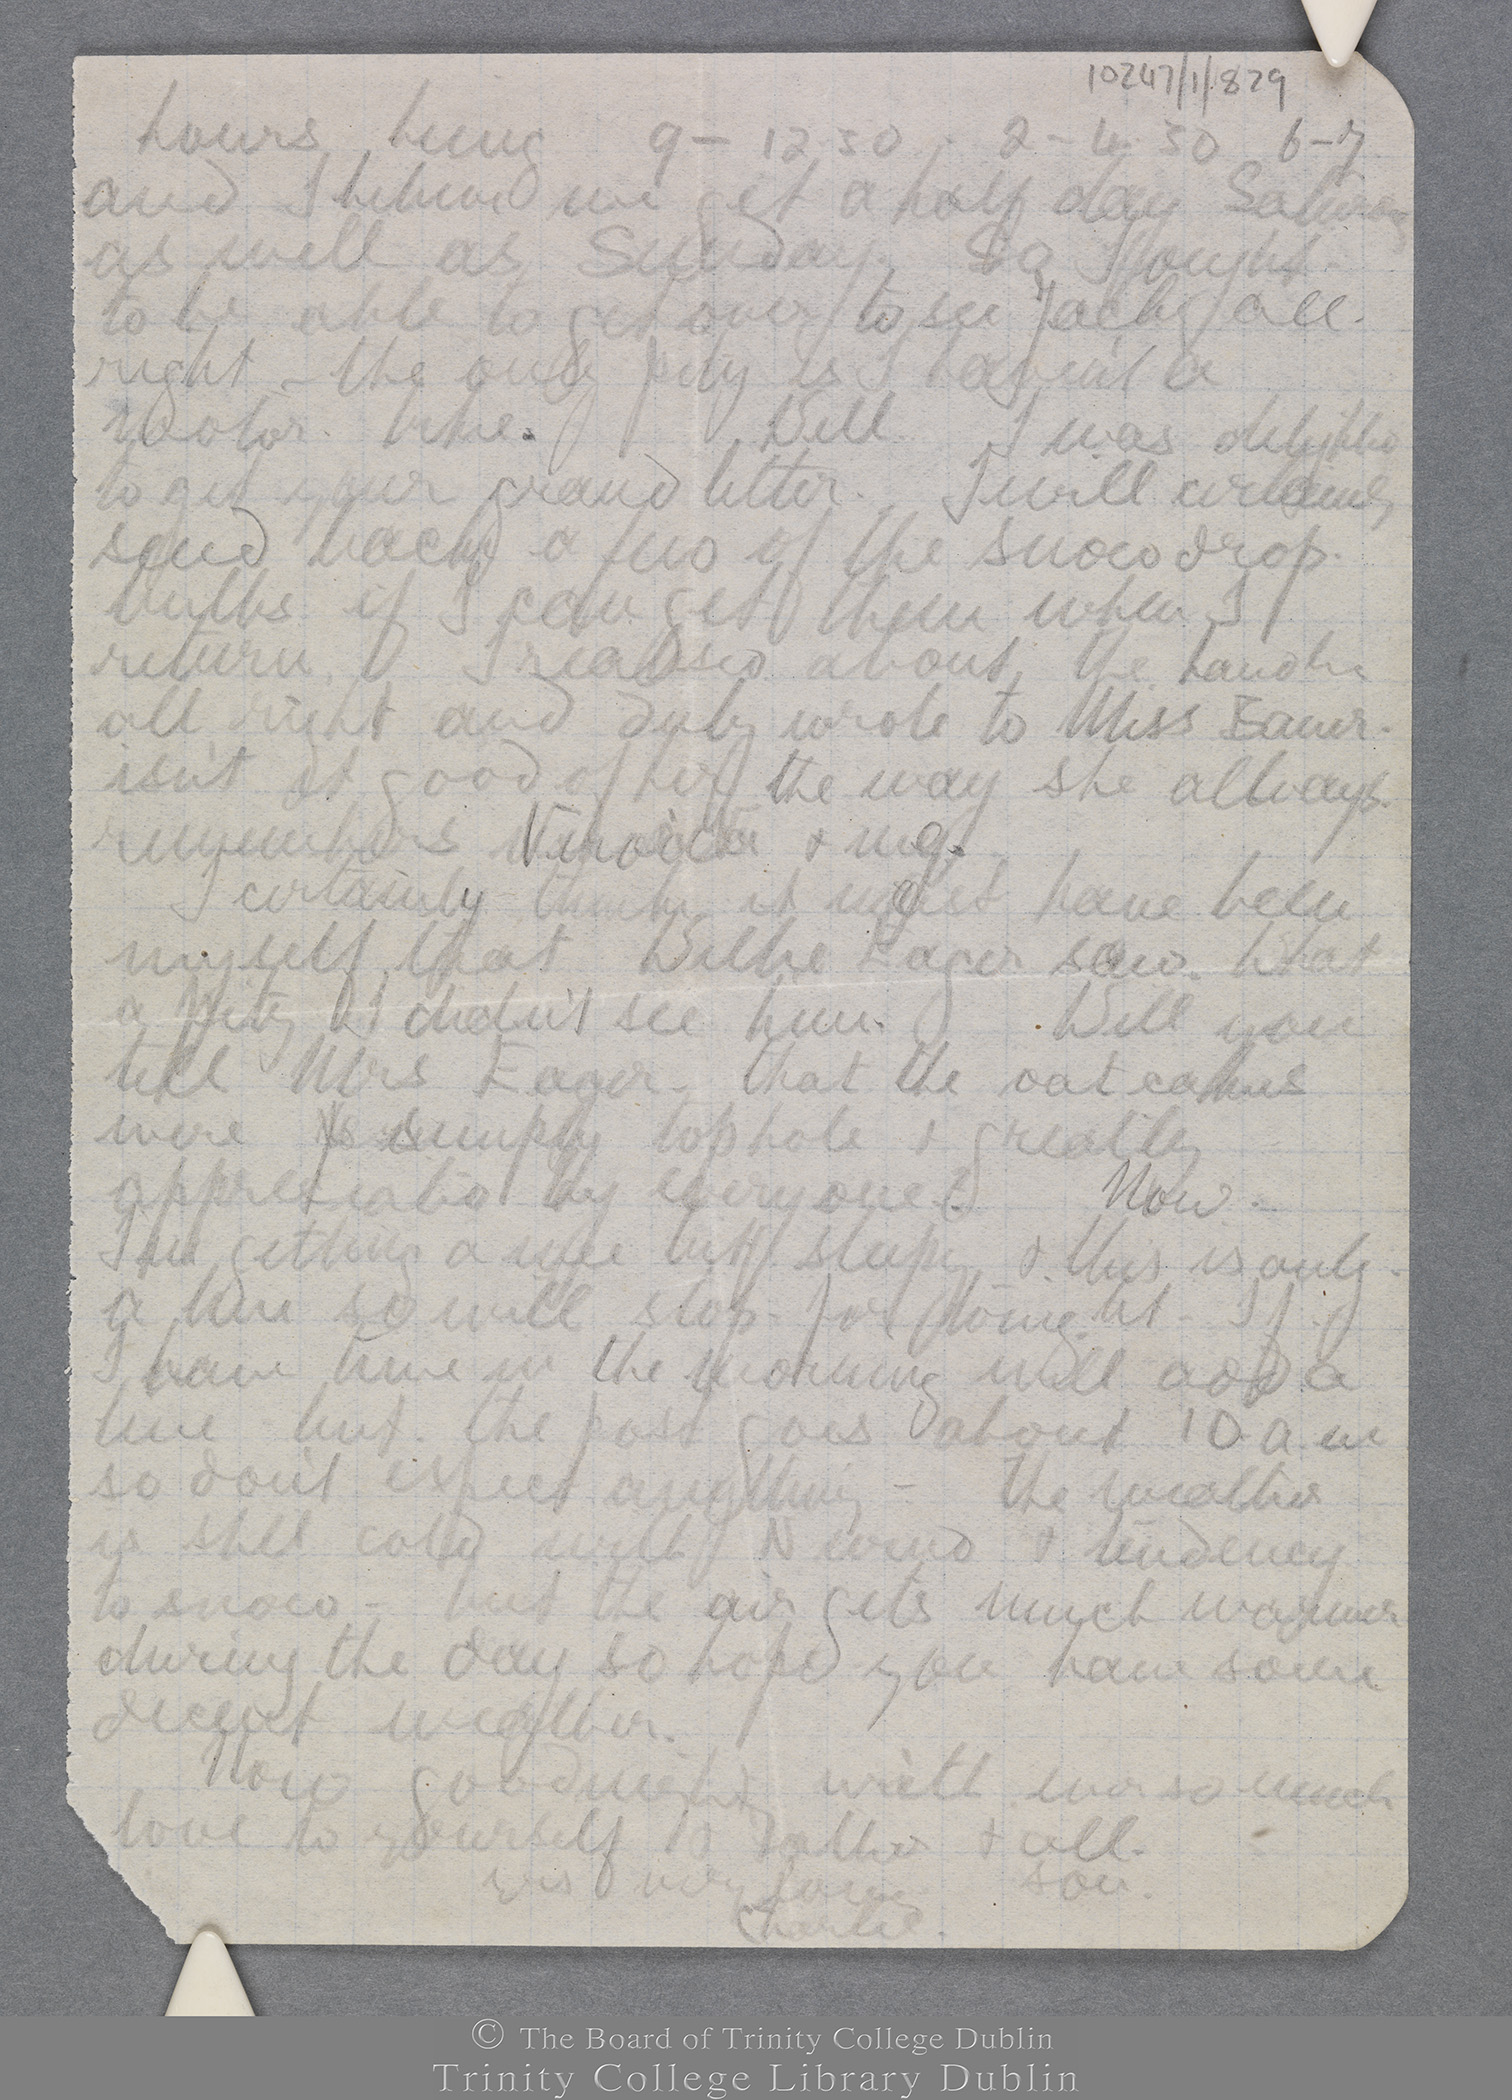 TCD MS 10247/1/829 folio 2 recto